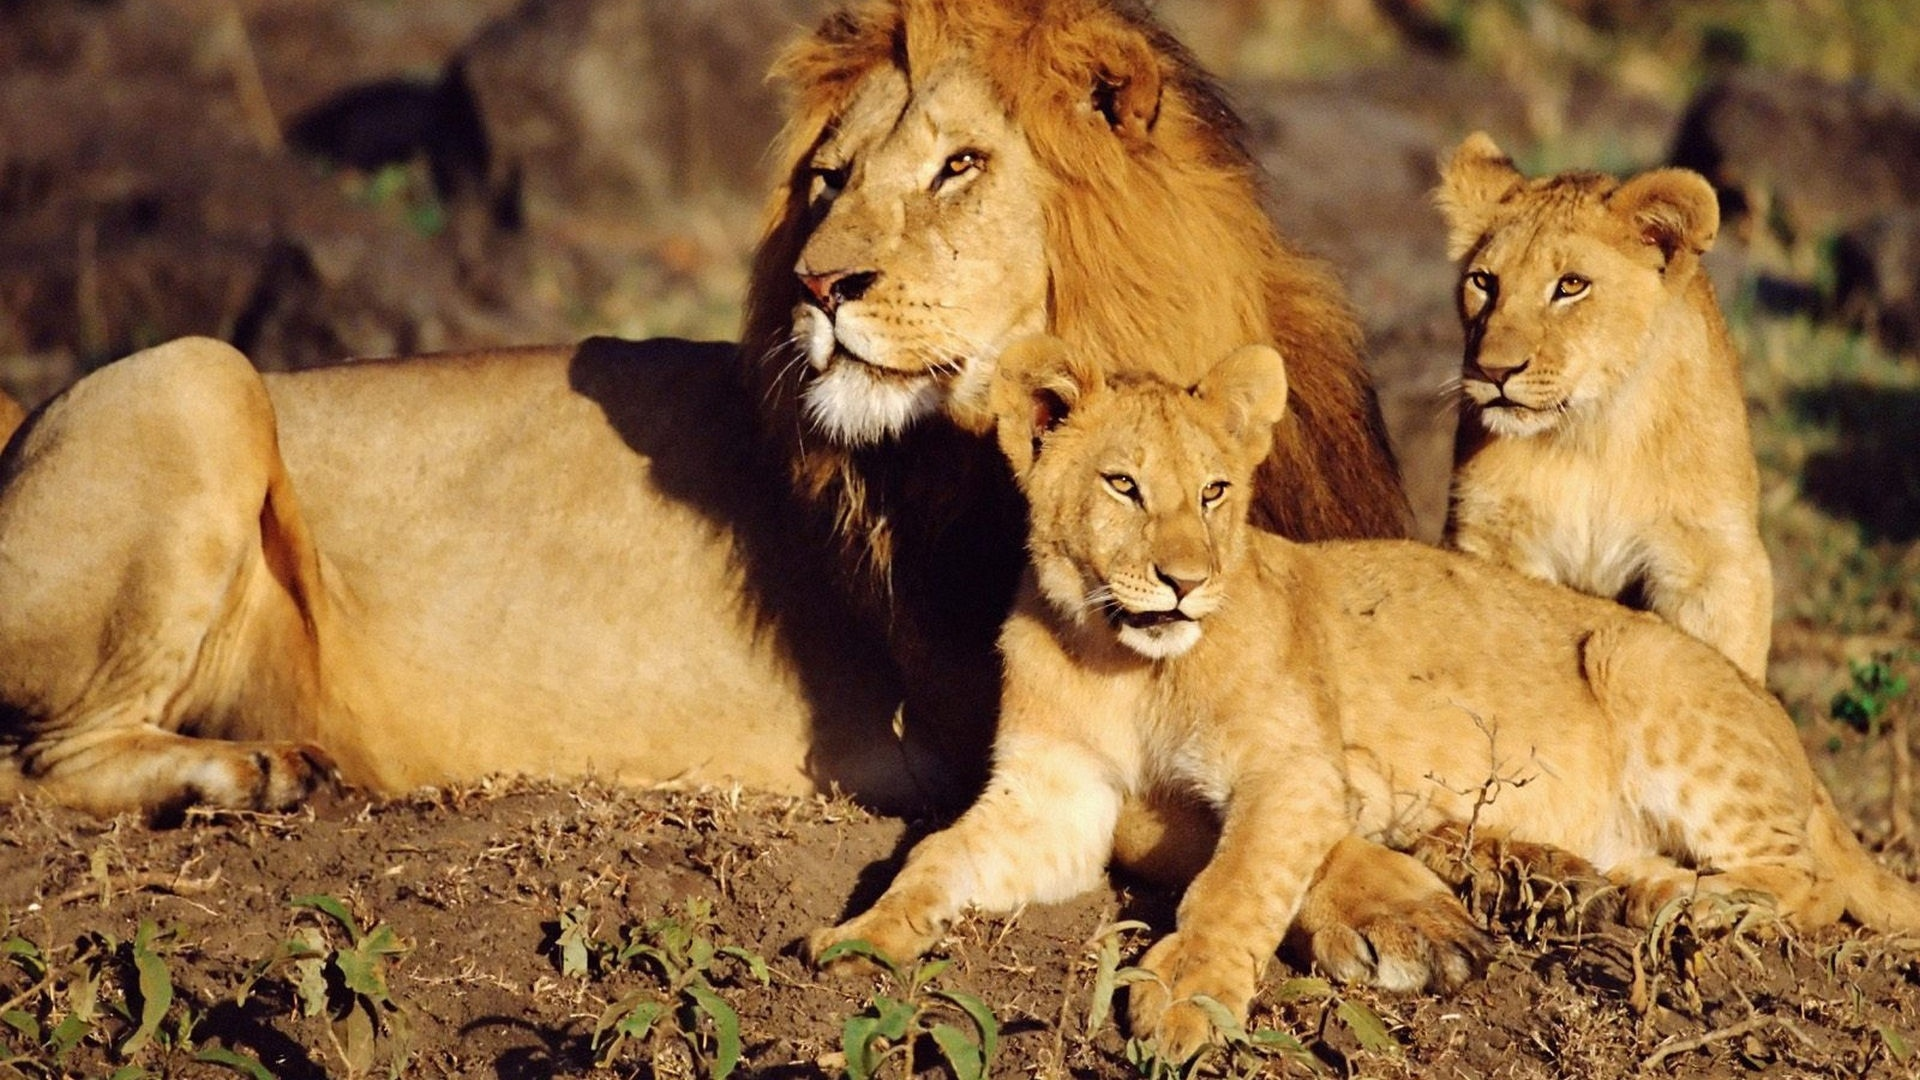 Lion Family Wallpaper HD 19422 - Baltana